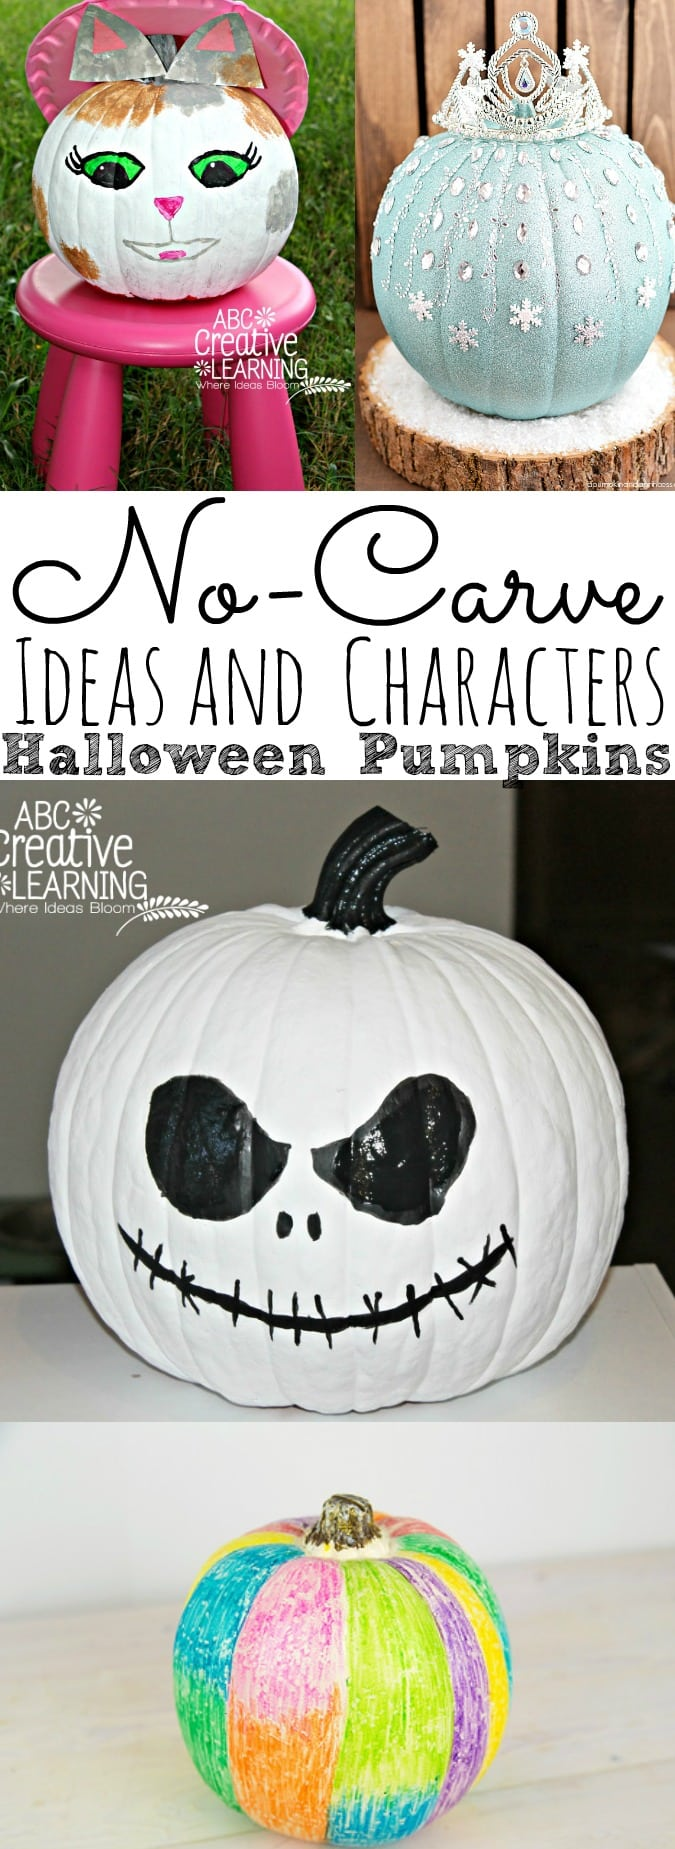 No-Carve Halloween Pumpkin Ideas